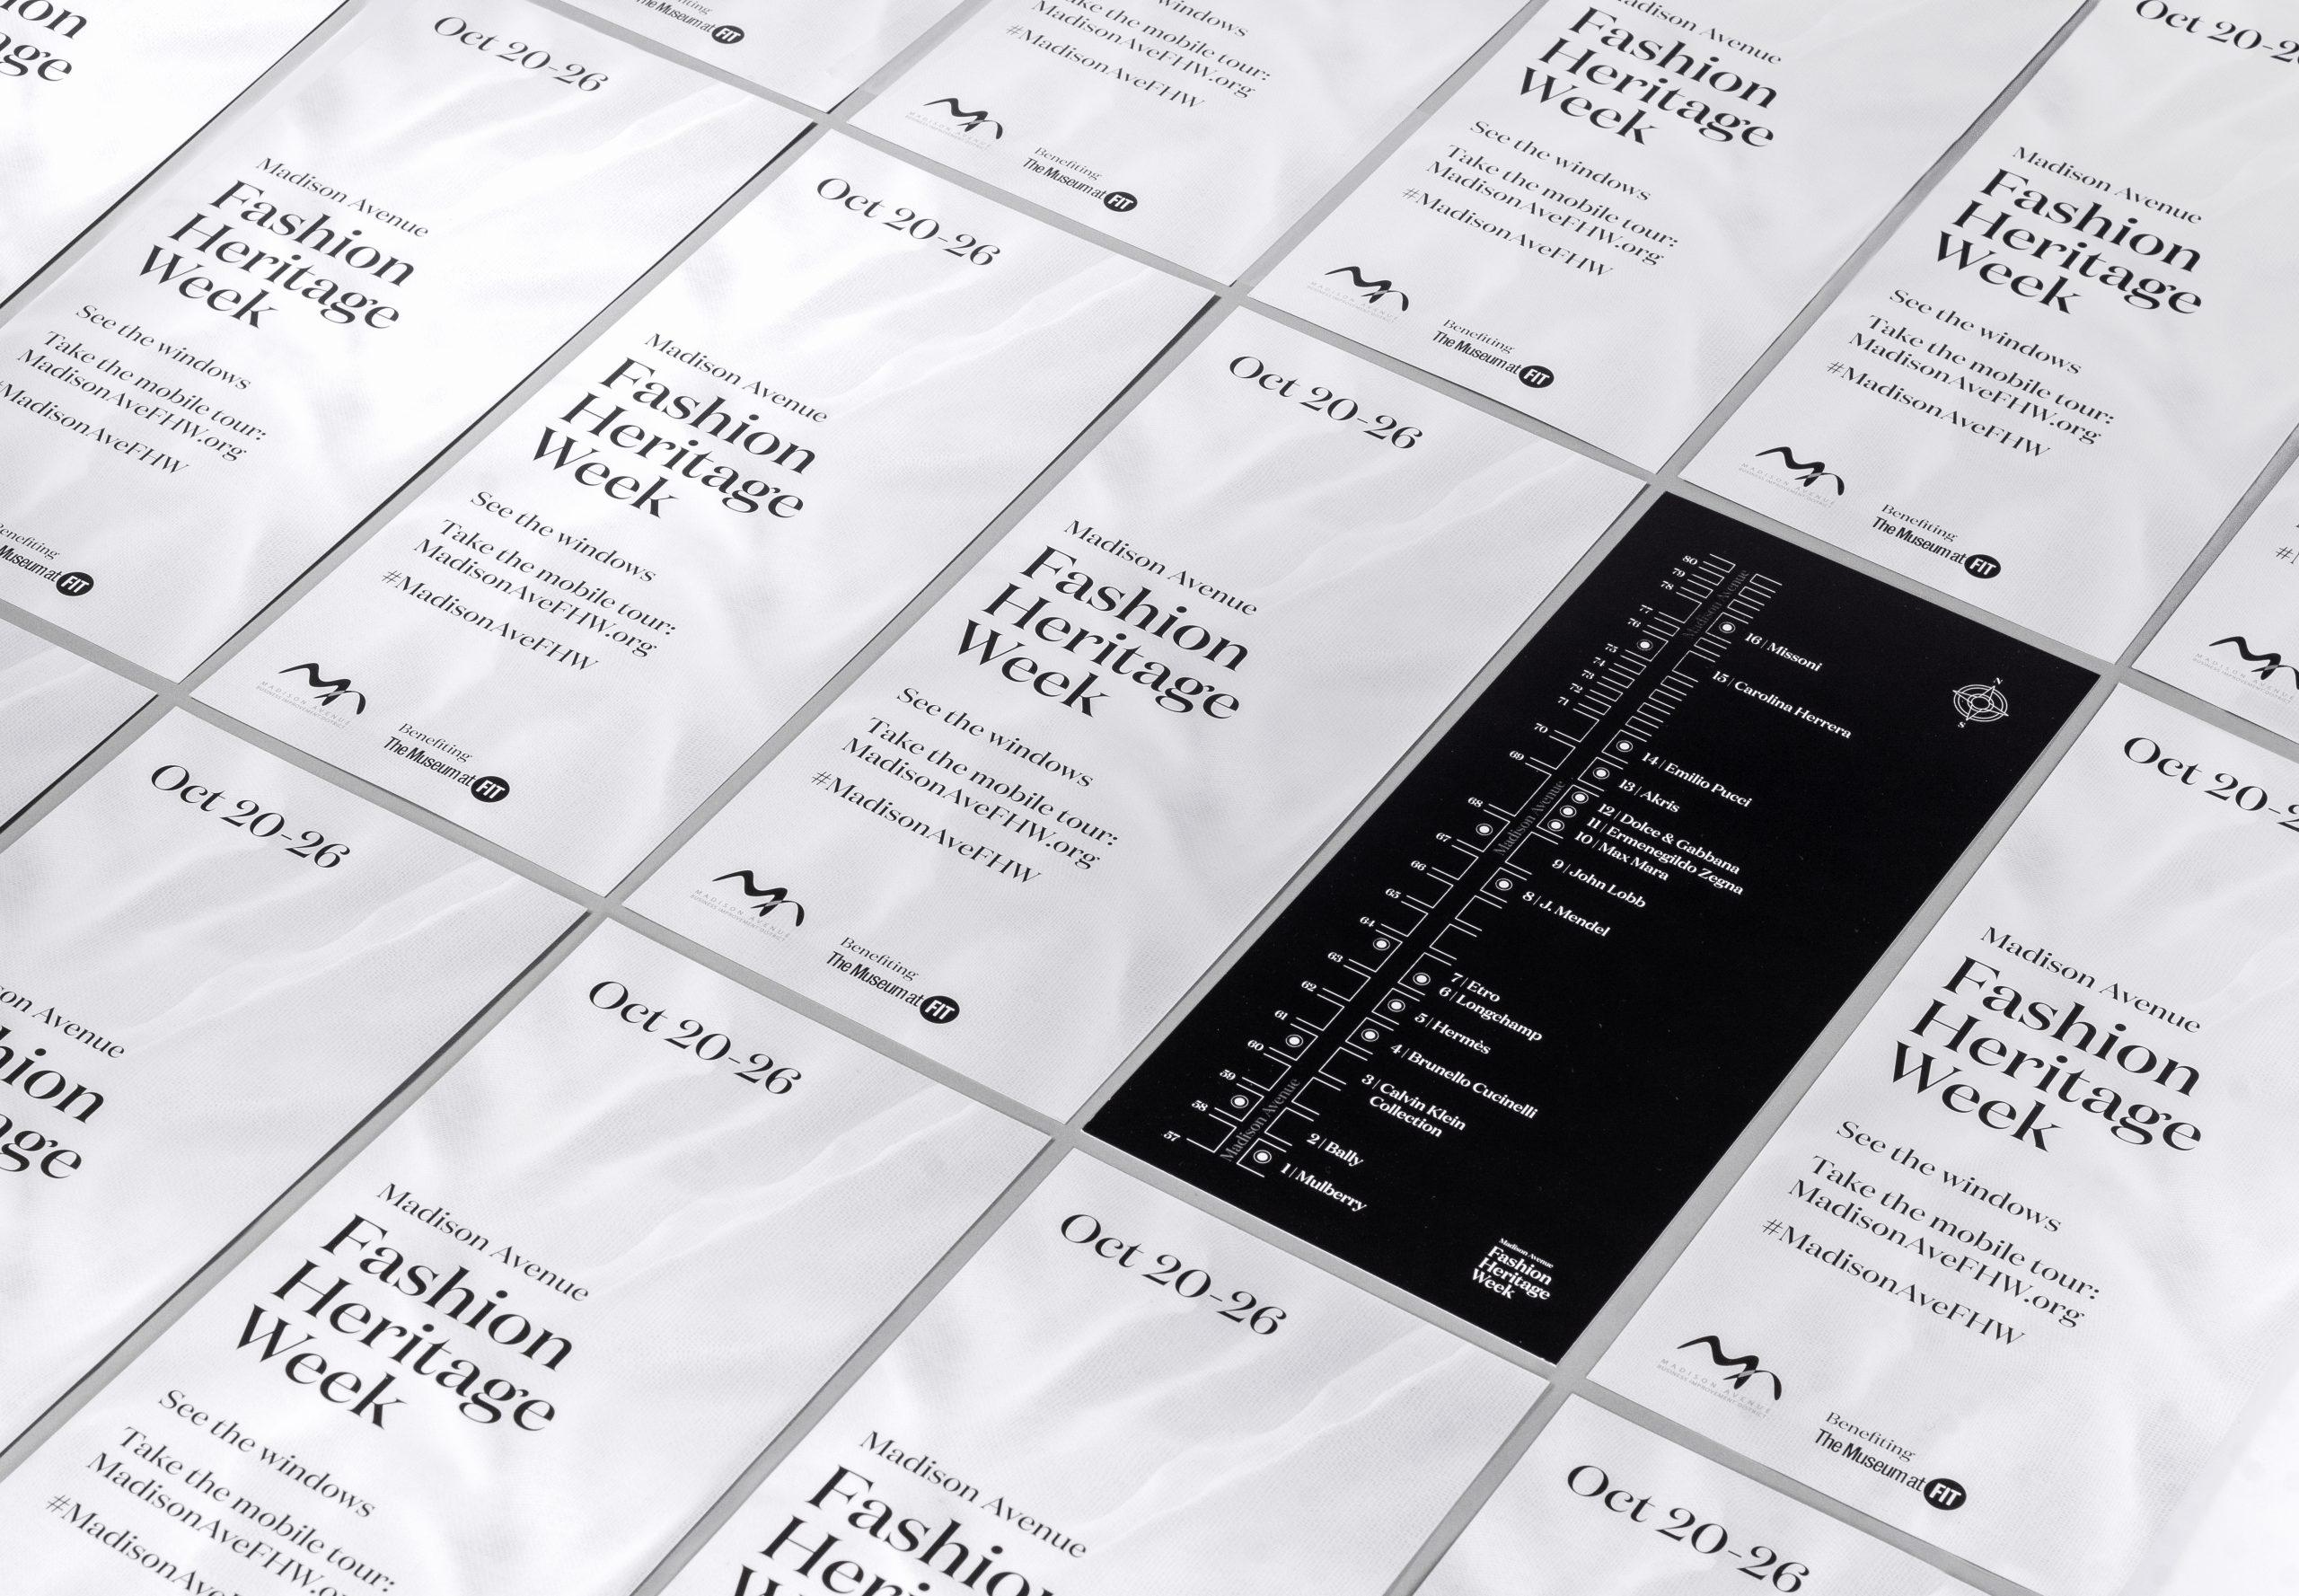 10 Madison Avenue Fashion Heritage Week Folder Full (JPG)